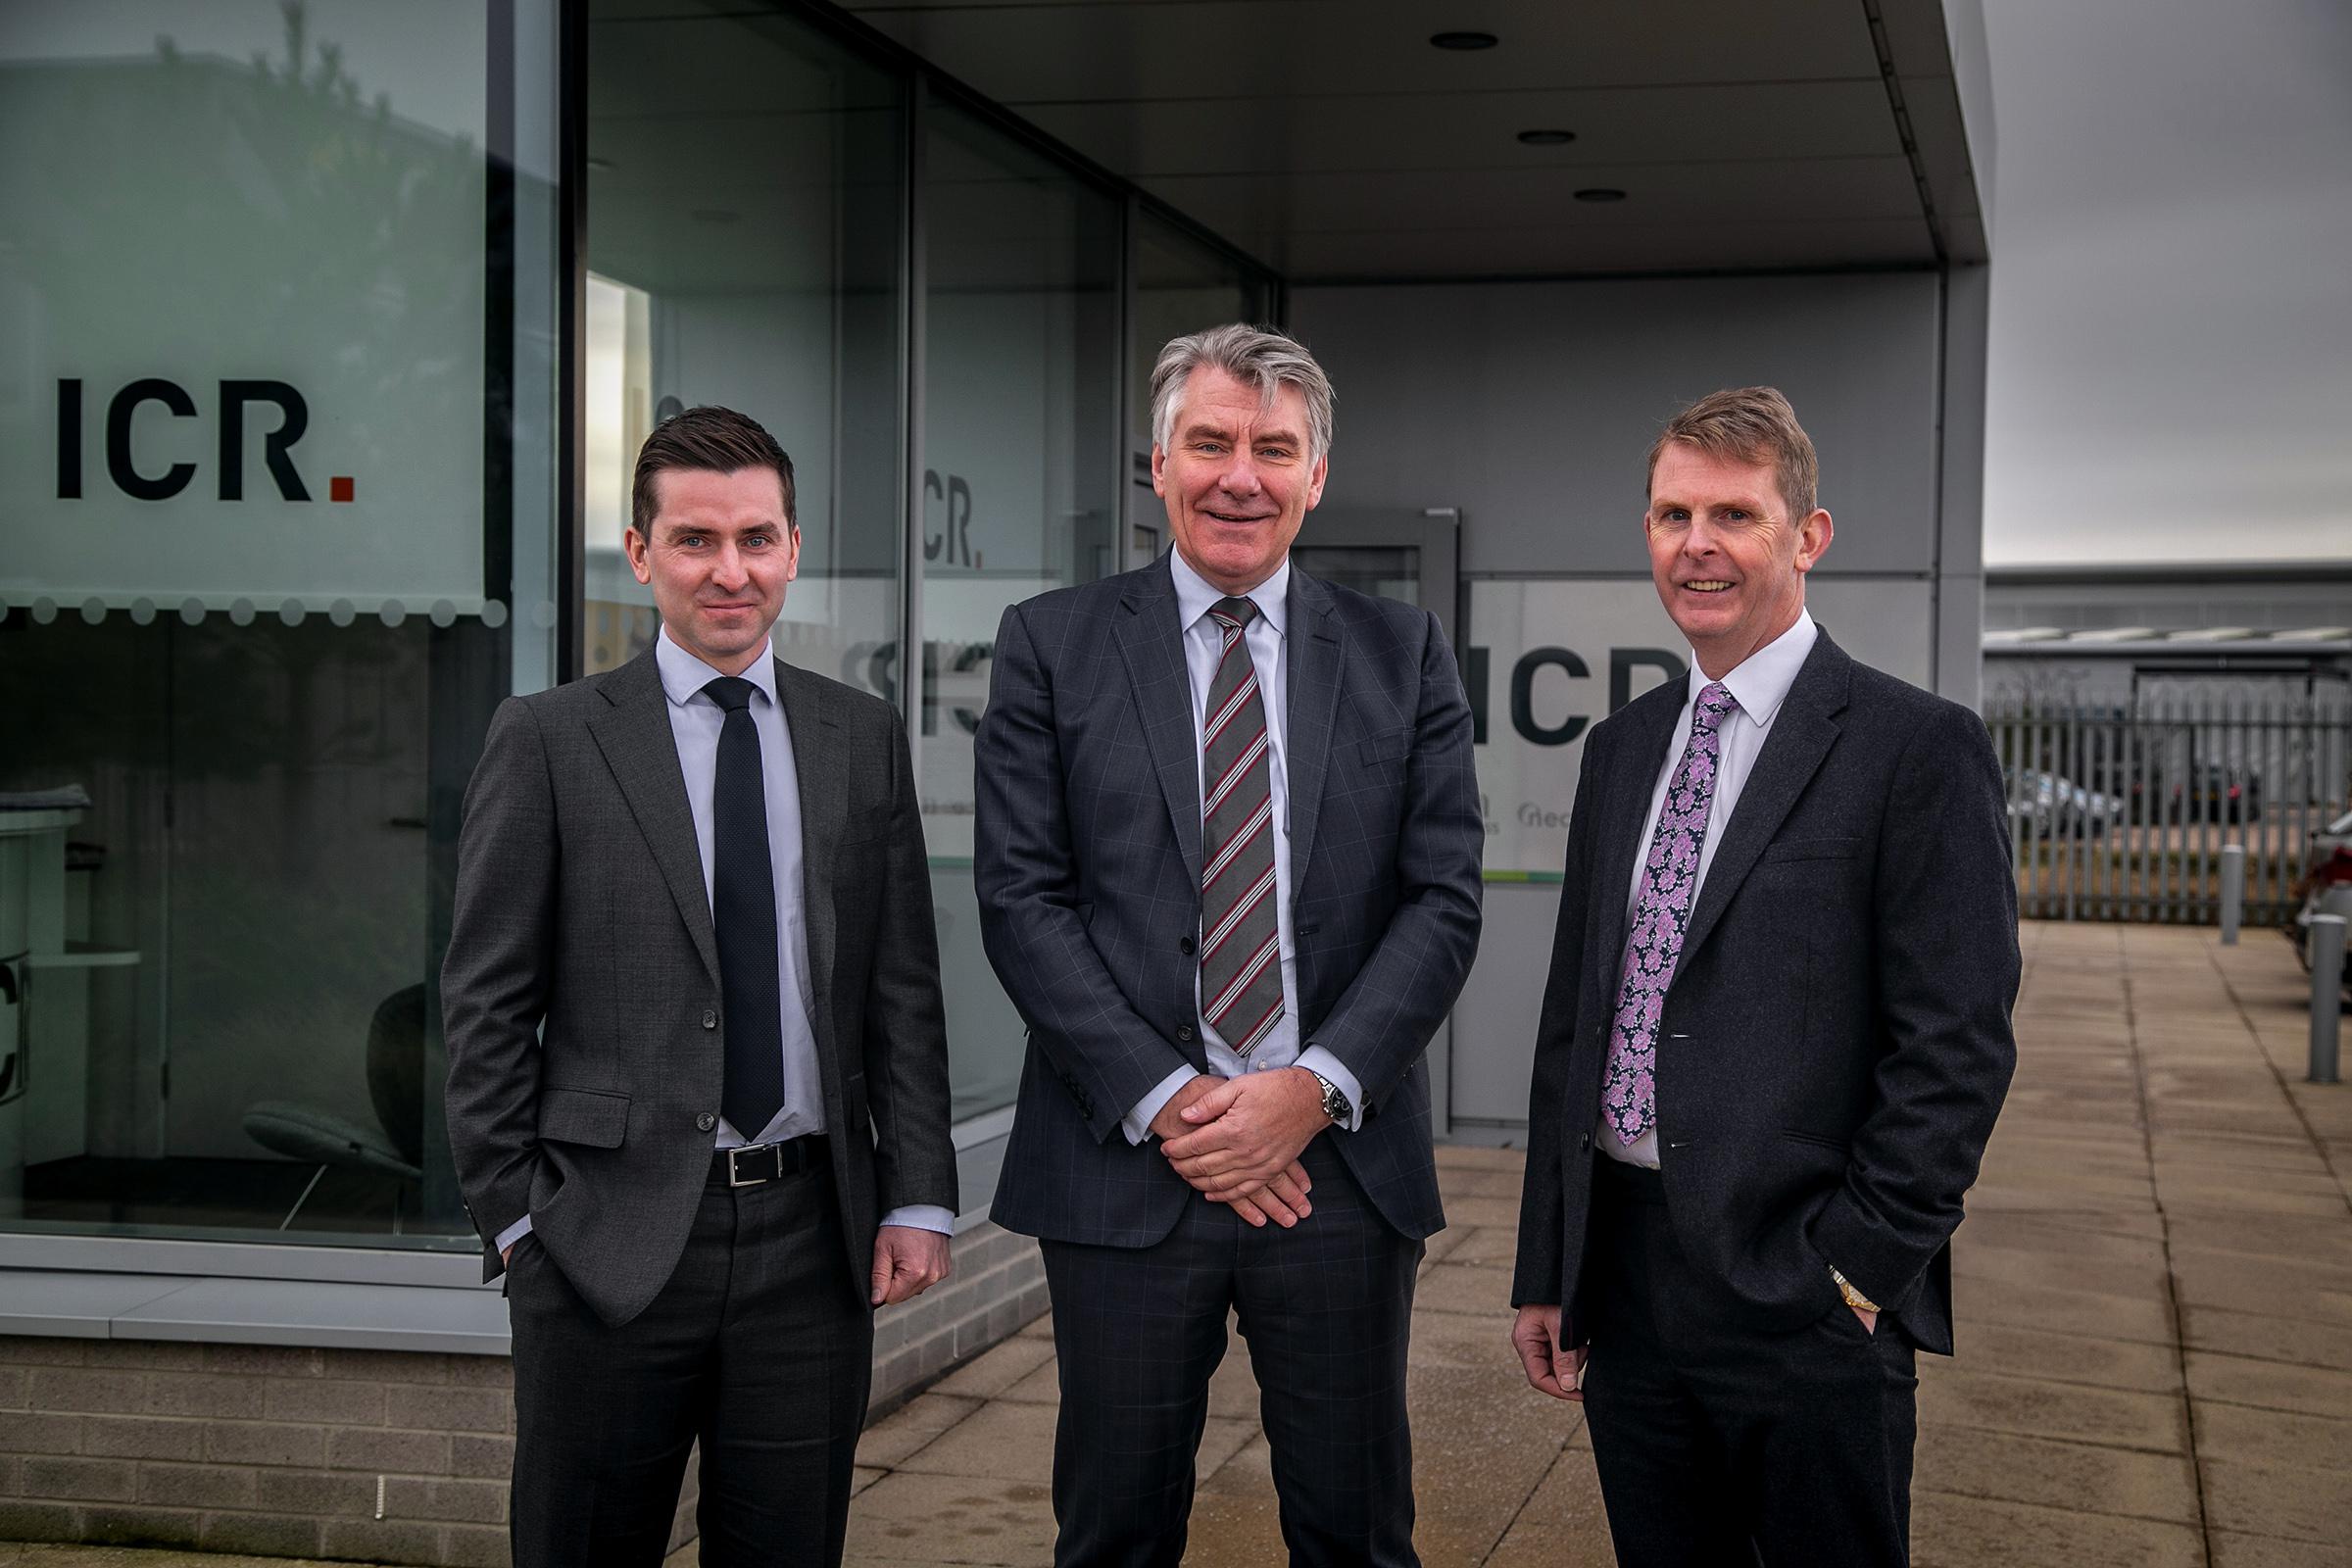 Alan McQuade, Bill Bayliss and Richard Wilson.